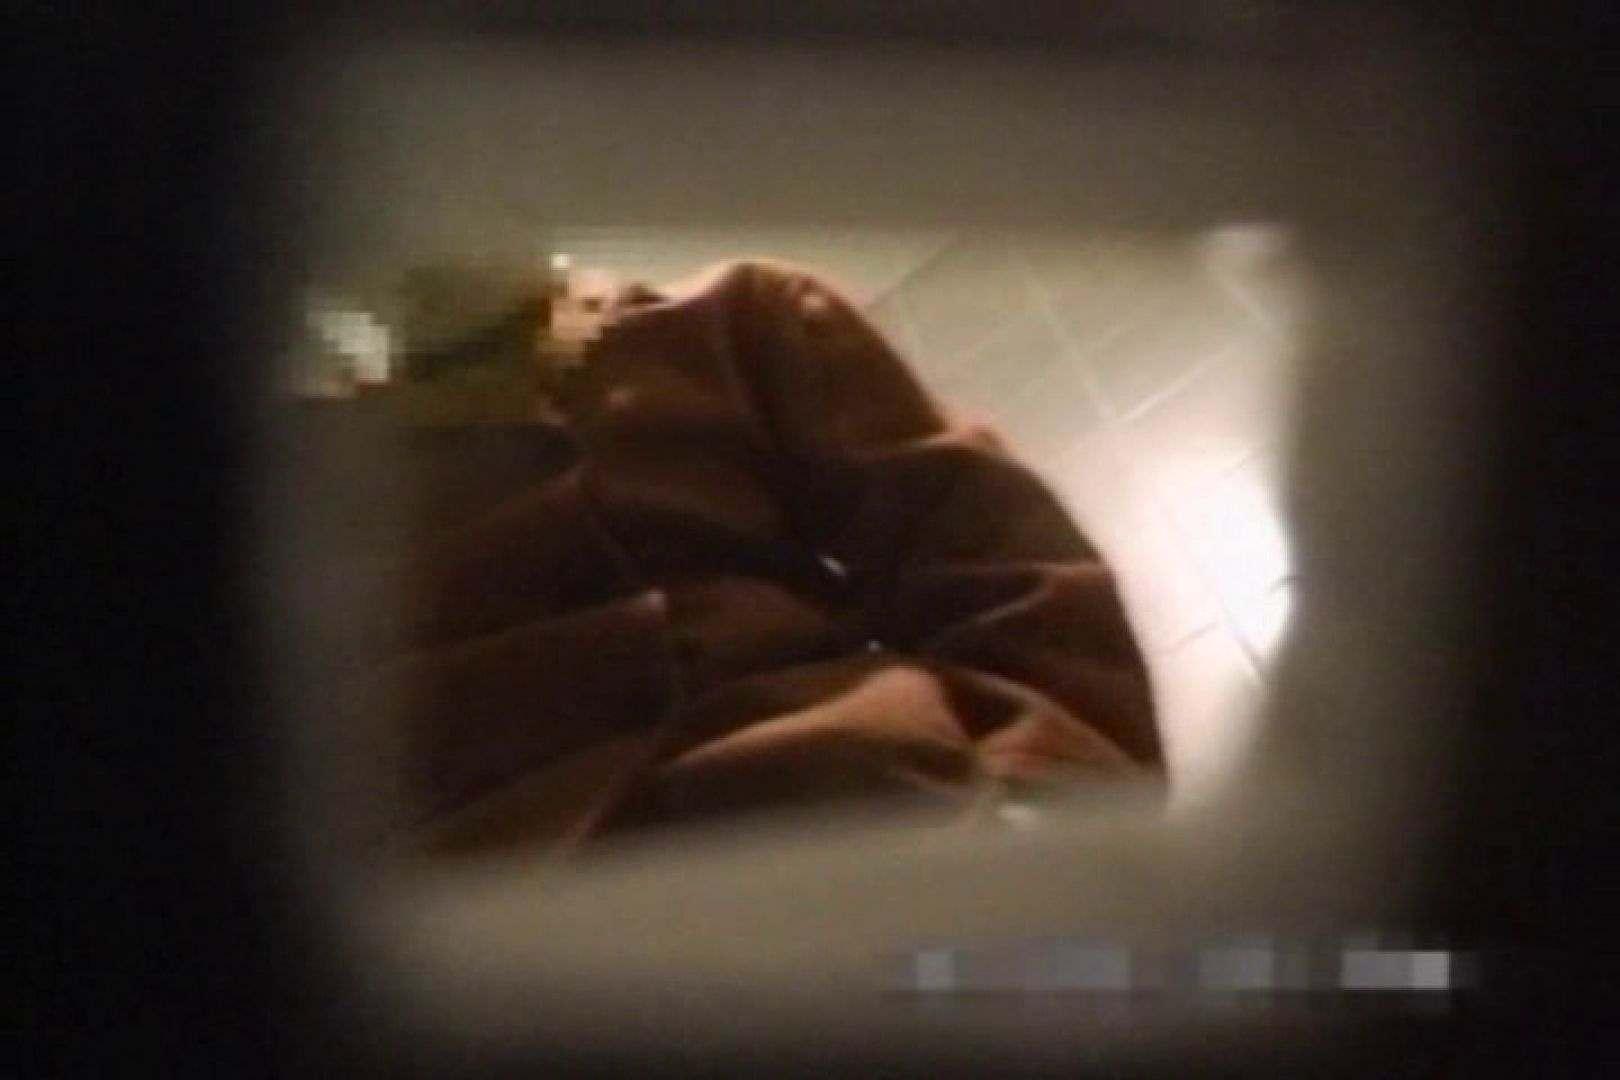 STY-013 実録!2カメde女子洗面所 洗面所 濡れ場動画紹介 90連発 17